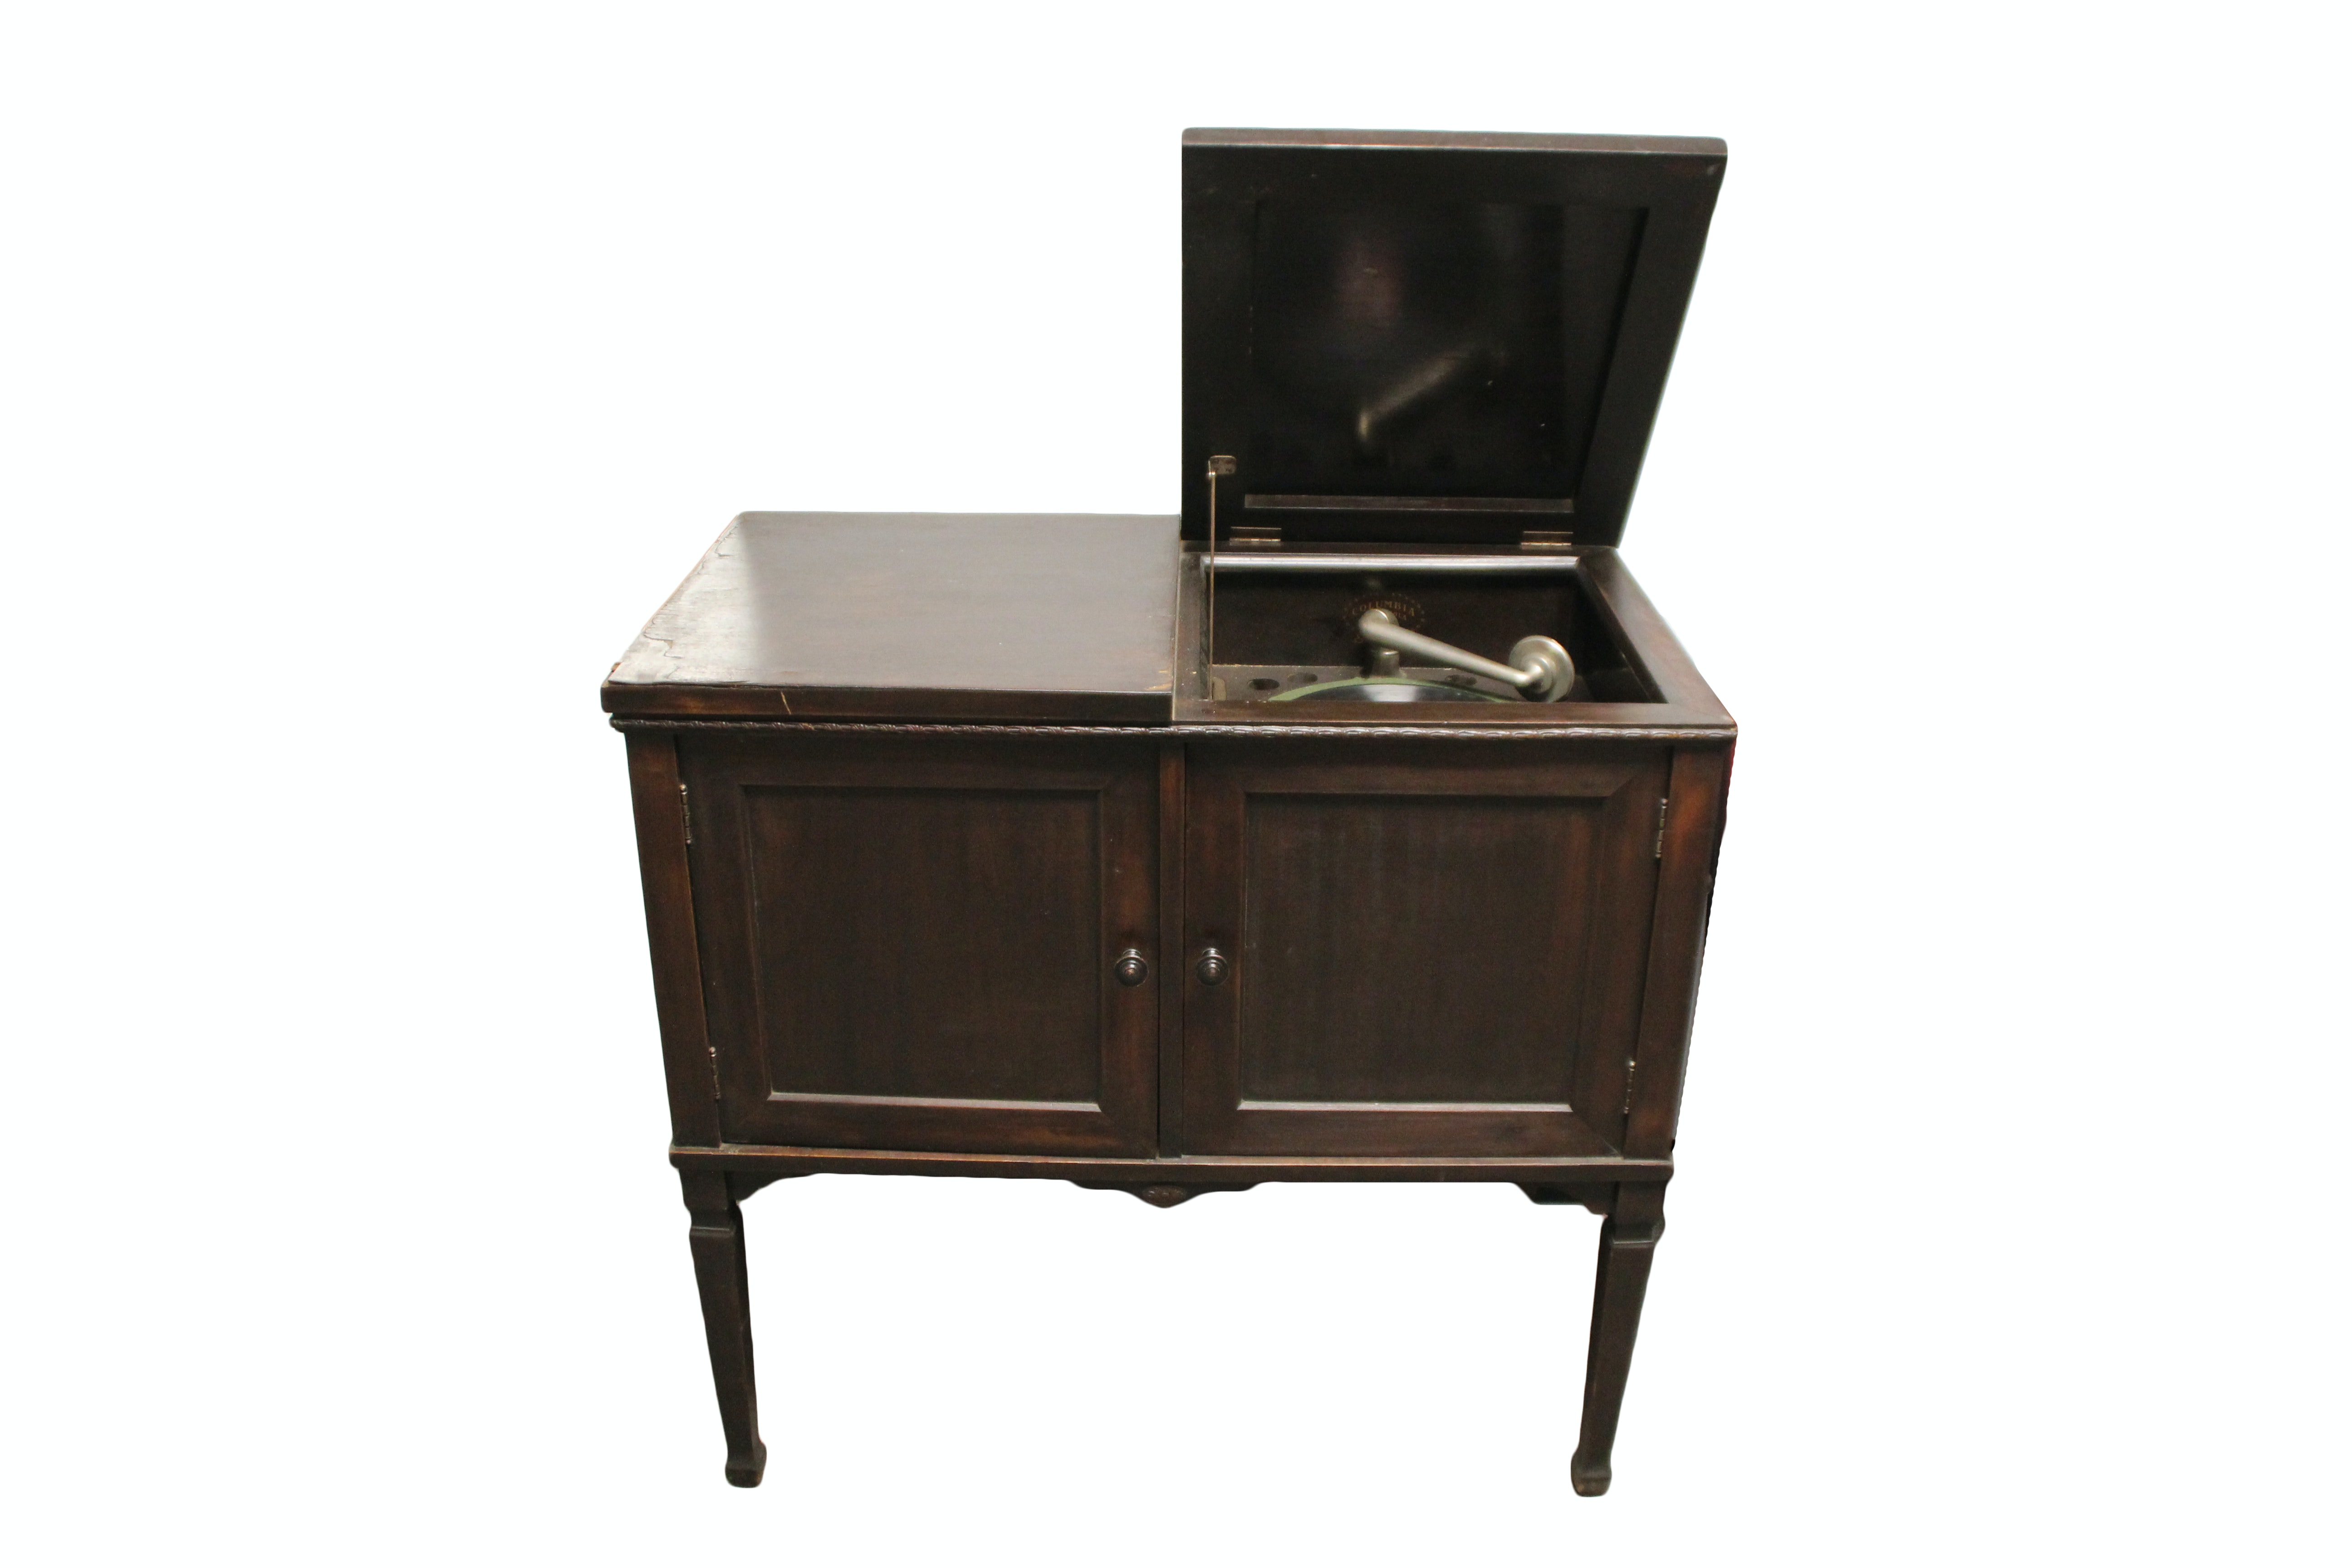 Superbe Vintage Columbia Grafonola Hand Crank Phonograph Cabinet ...